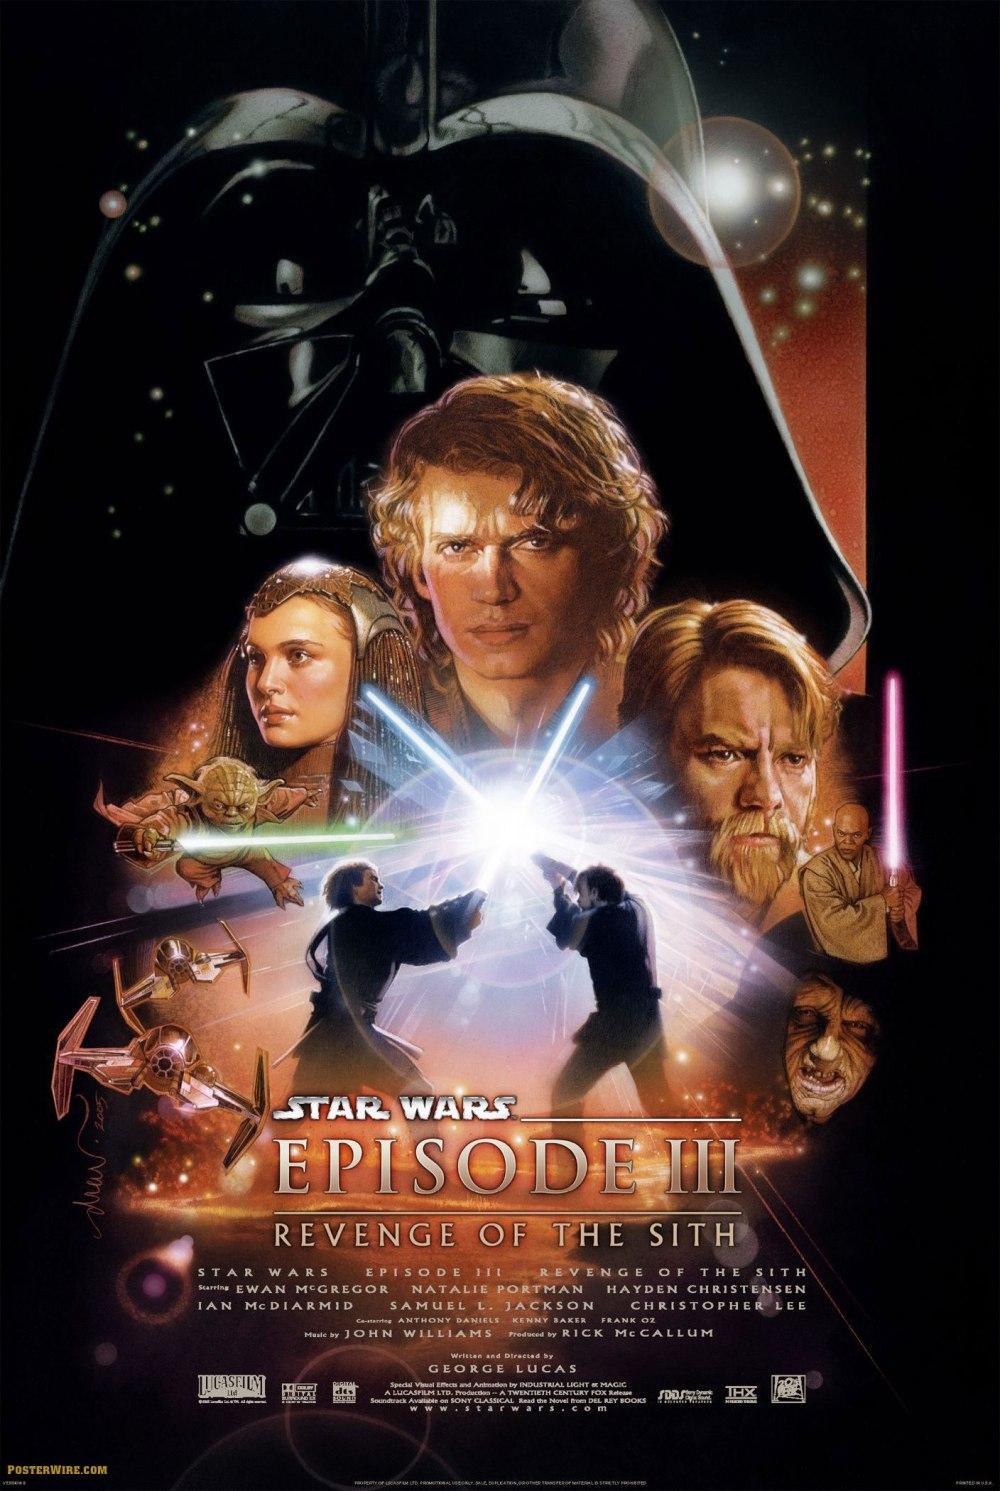 Star Wars: Episode III - Revenge of the Sith (2005, 20th Century Fox)